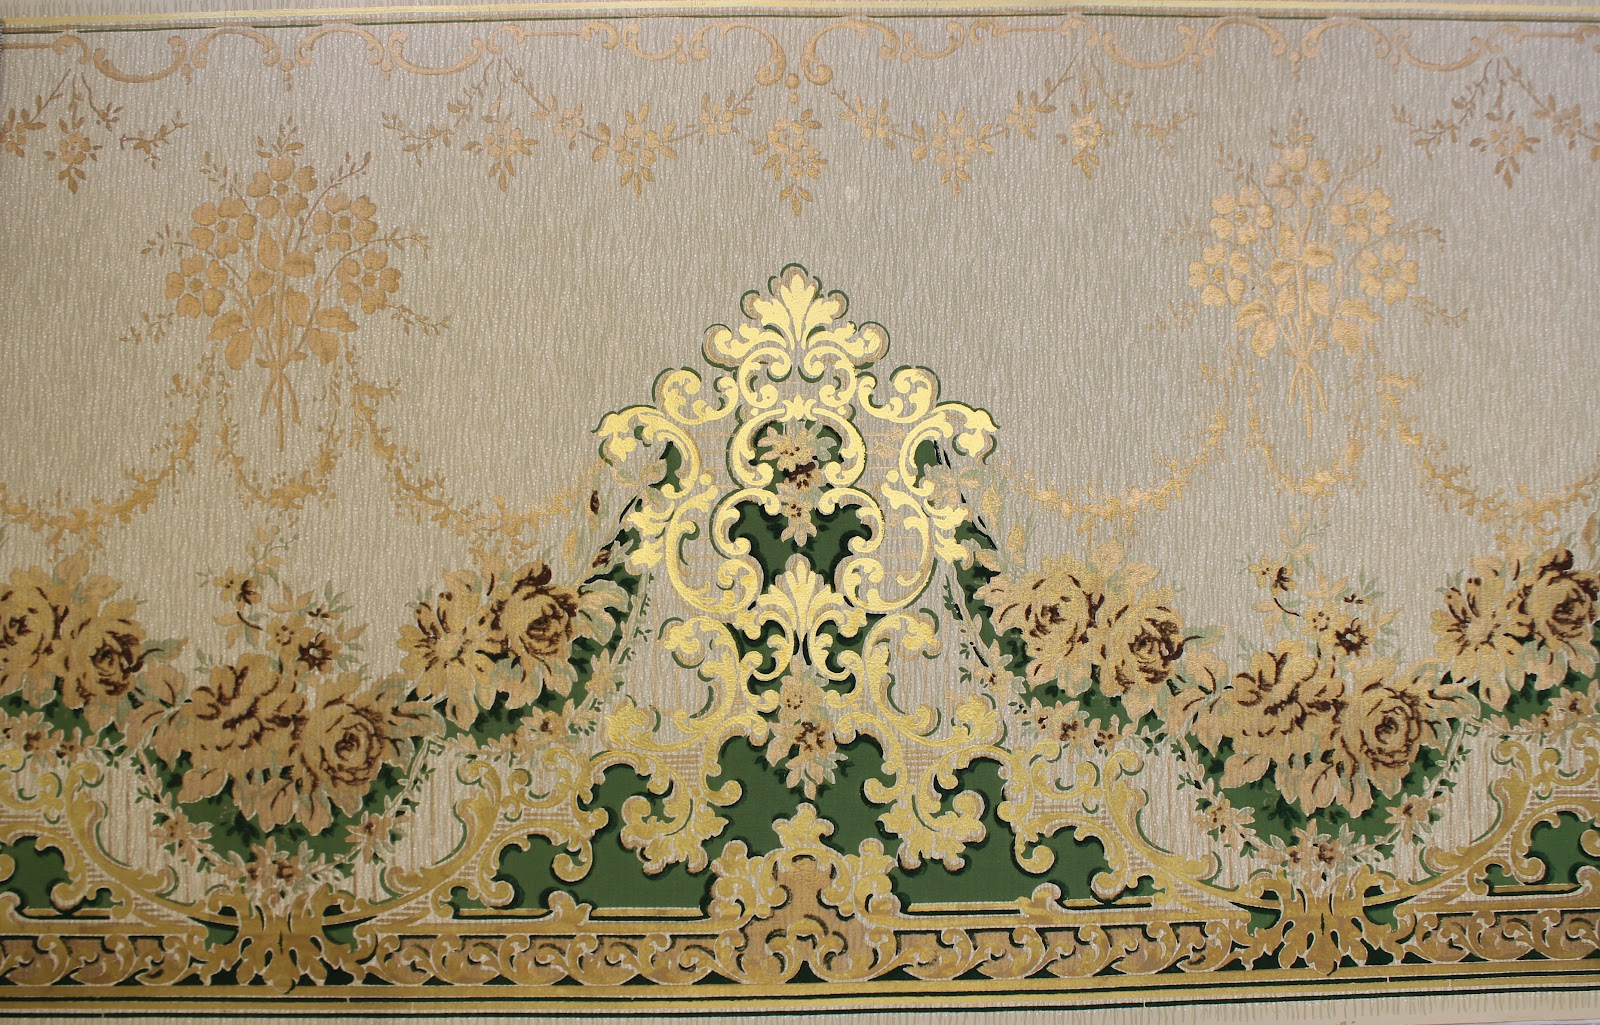 wallpaper pattern vintage - photo #33